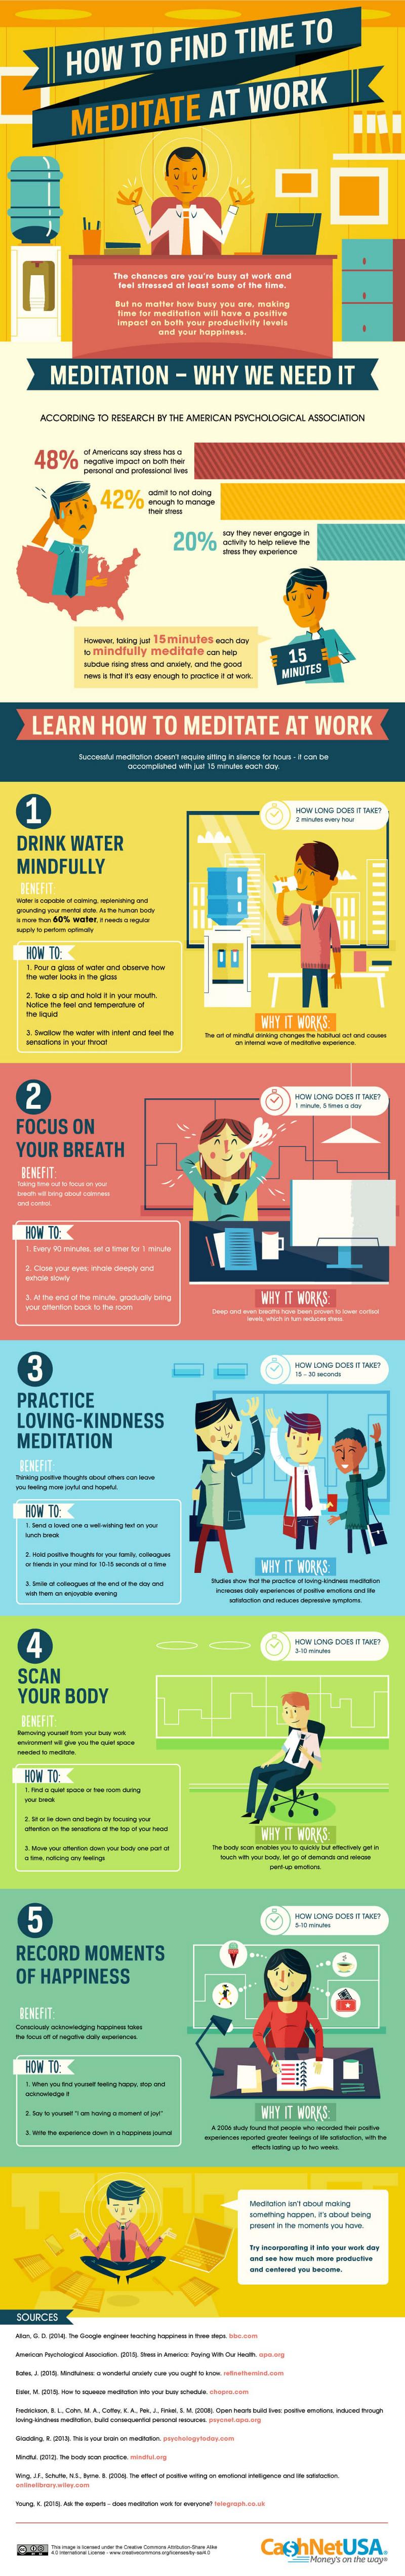 Meditate-at-Work